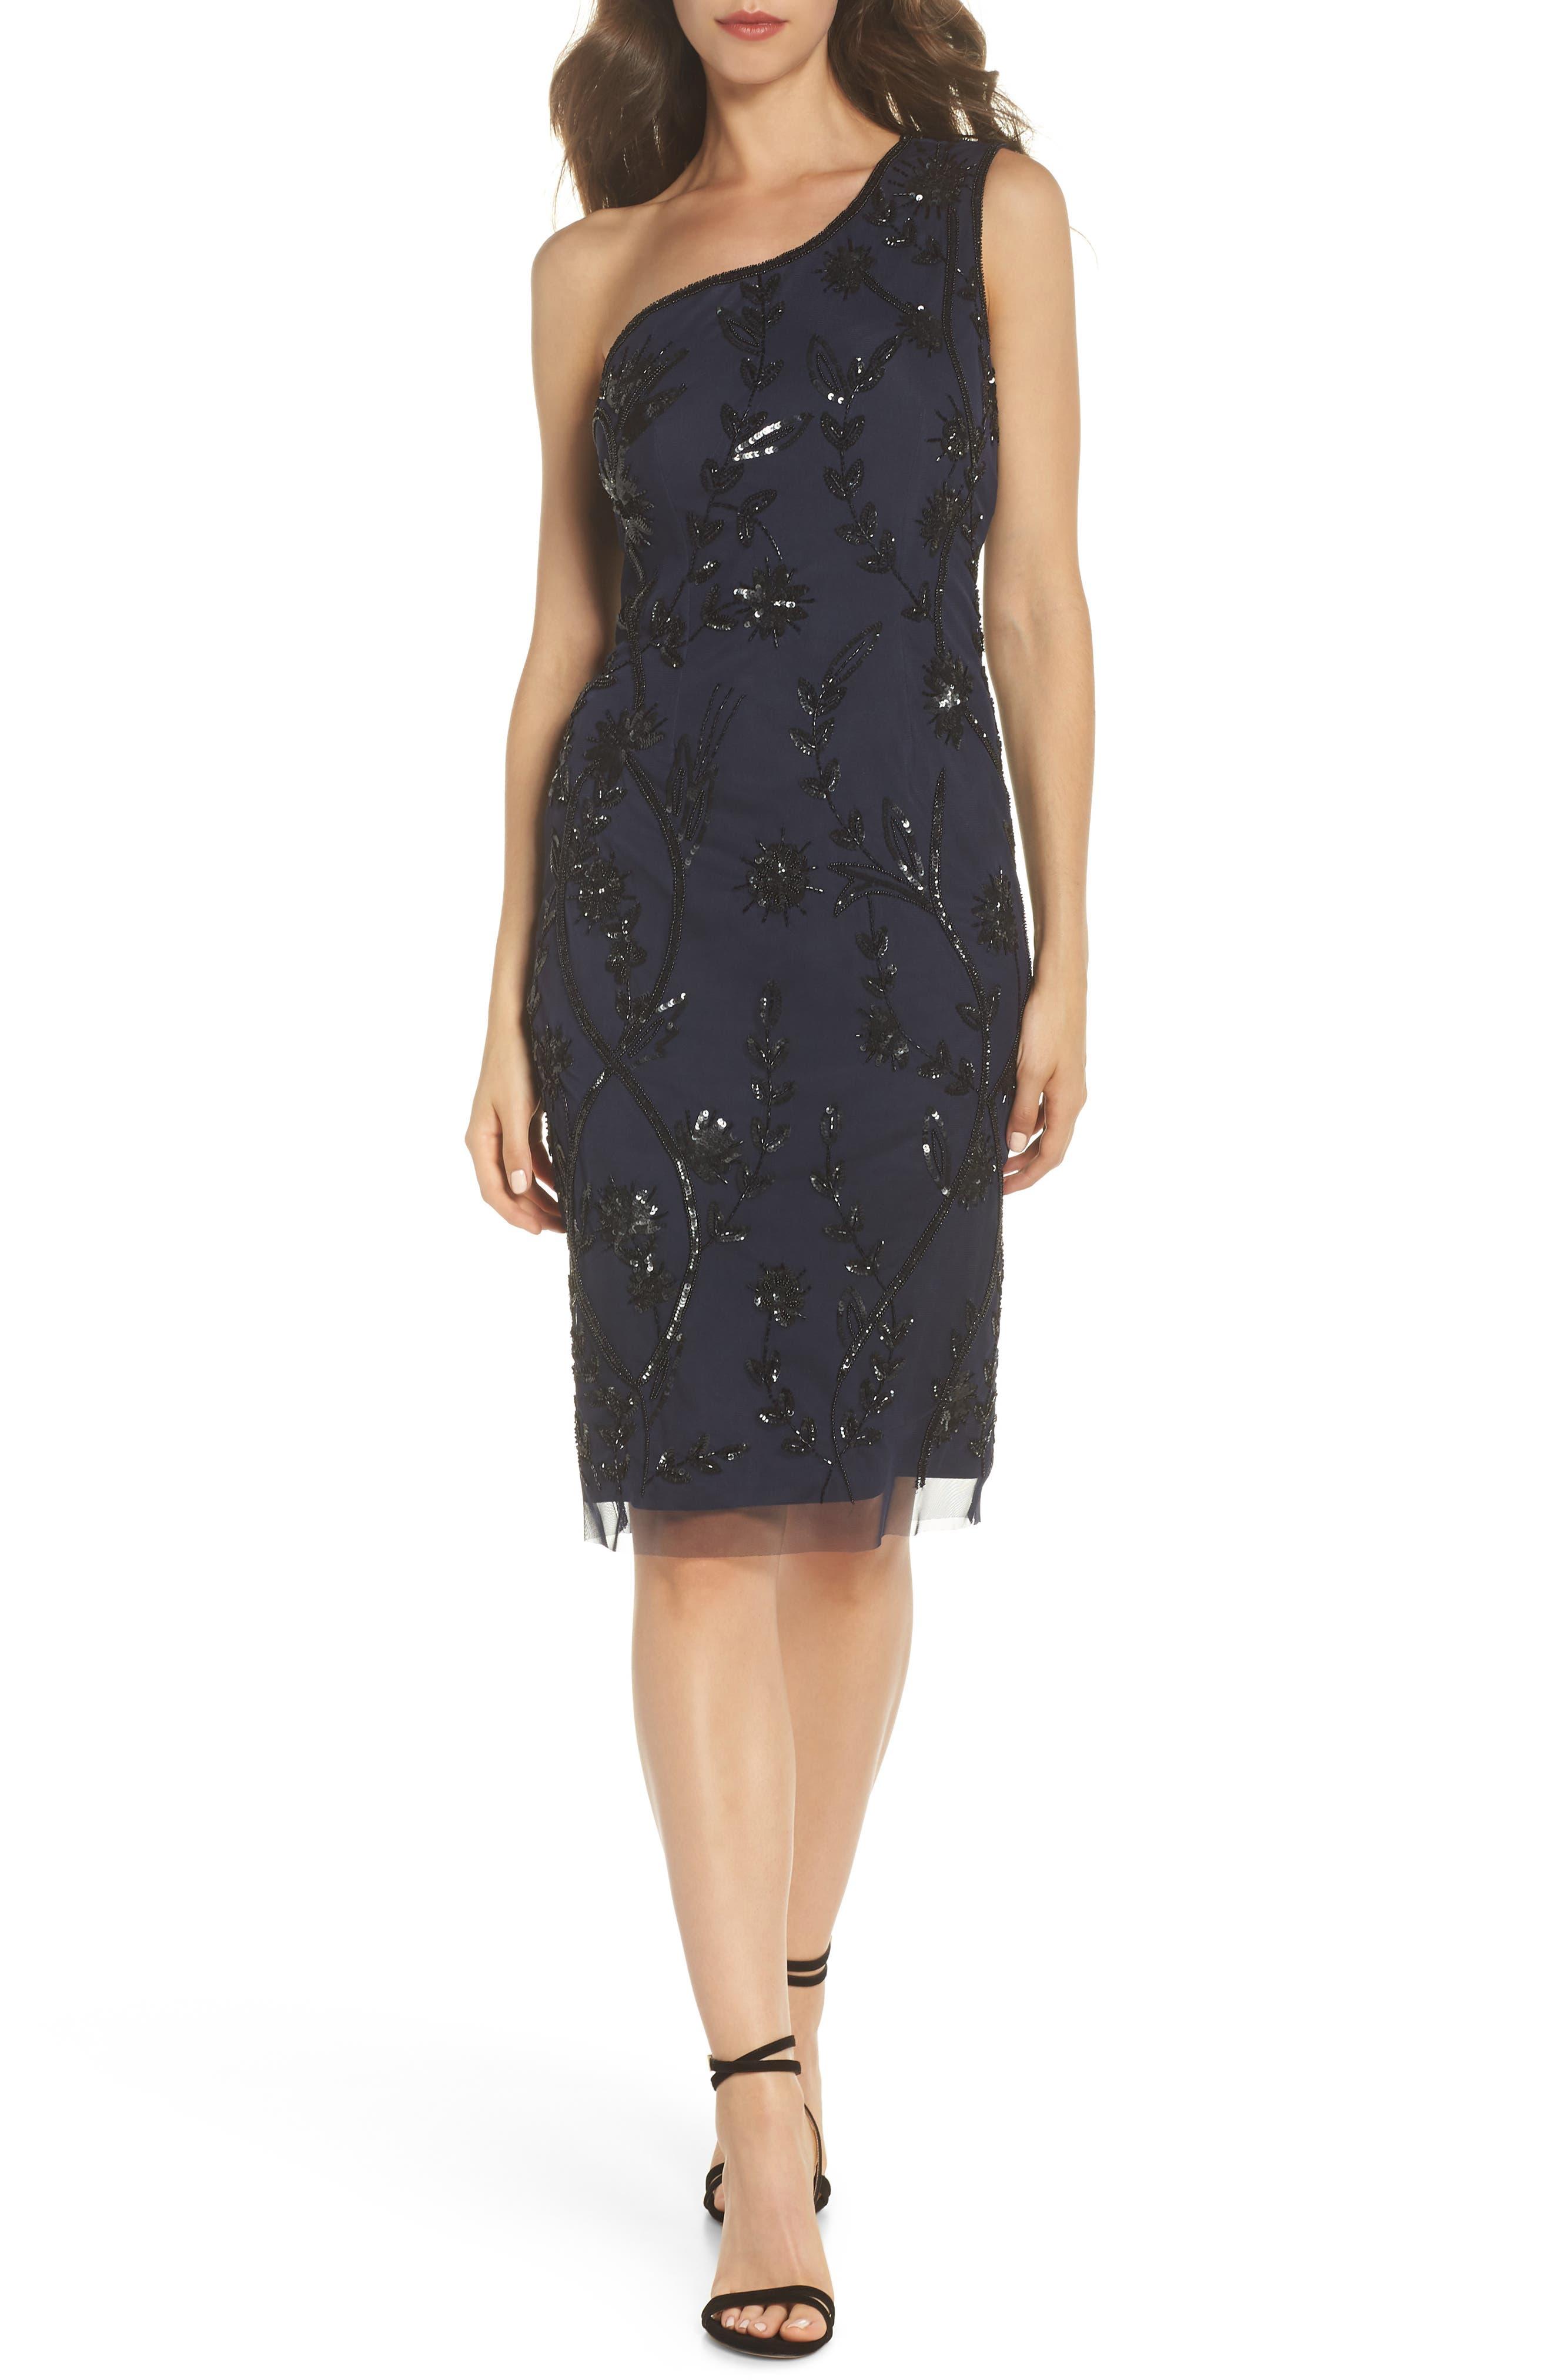 Beaded Sheath Dress,                             Main thumbnail 1, color,                             Navy/ Black